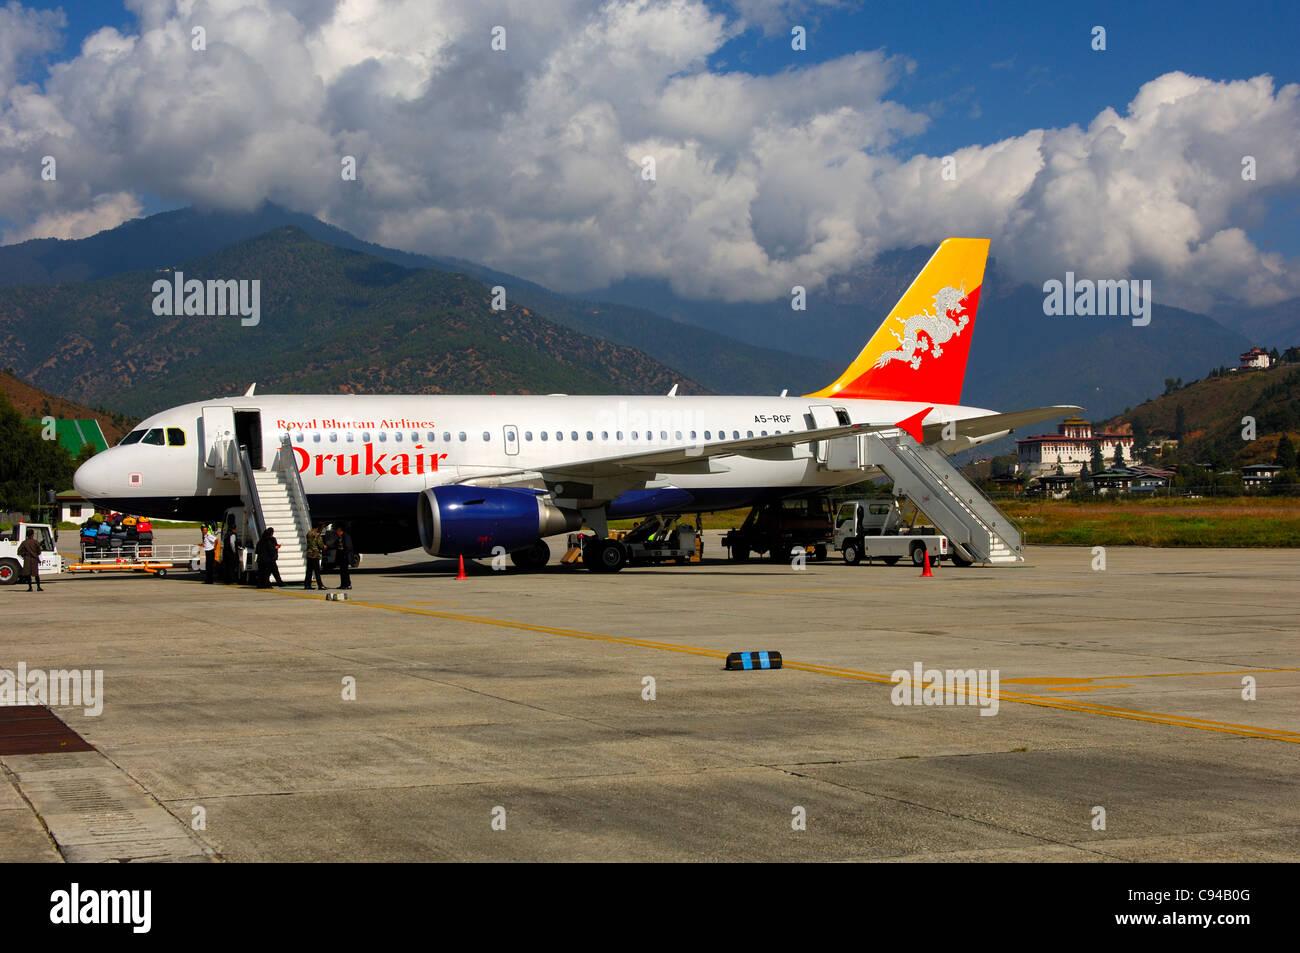 Drukair Airbus 319 arriving at Paro International Airport, Paro, Bhutan - Stock Image